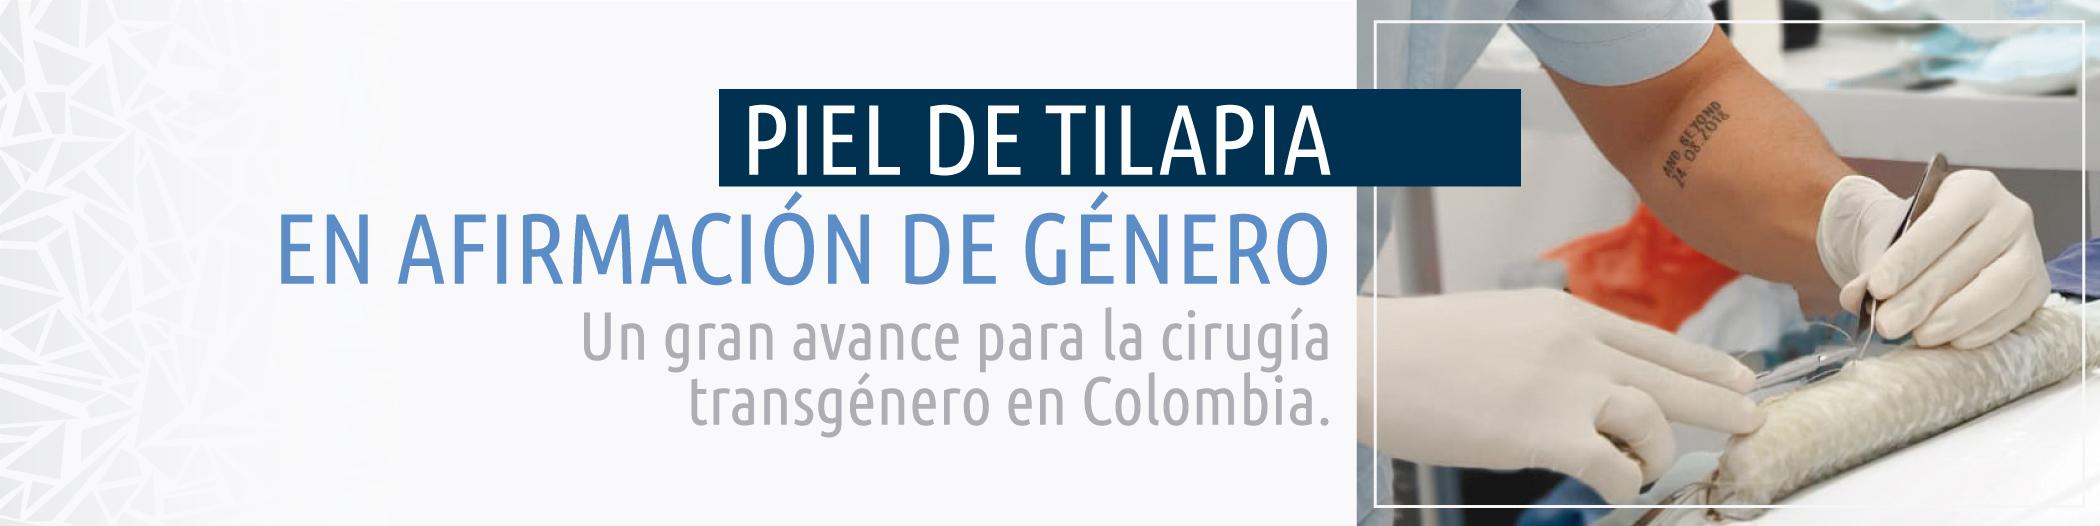 PIel de Tilapia | CECM Colombia - Dr. Álvaro Hernán Rodriguez